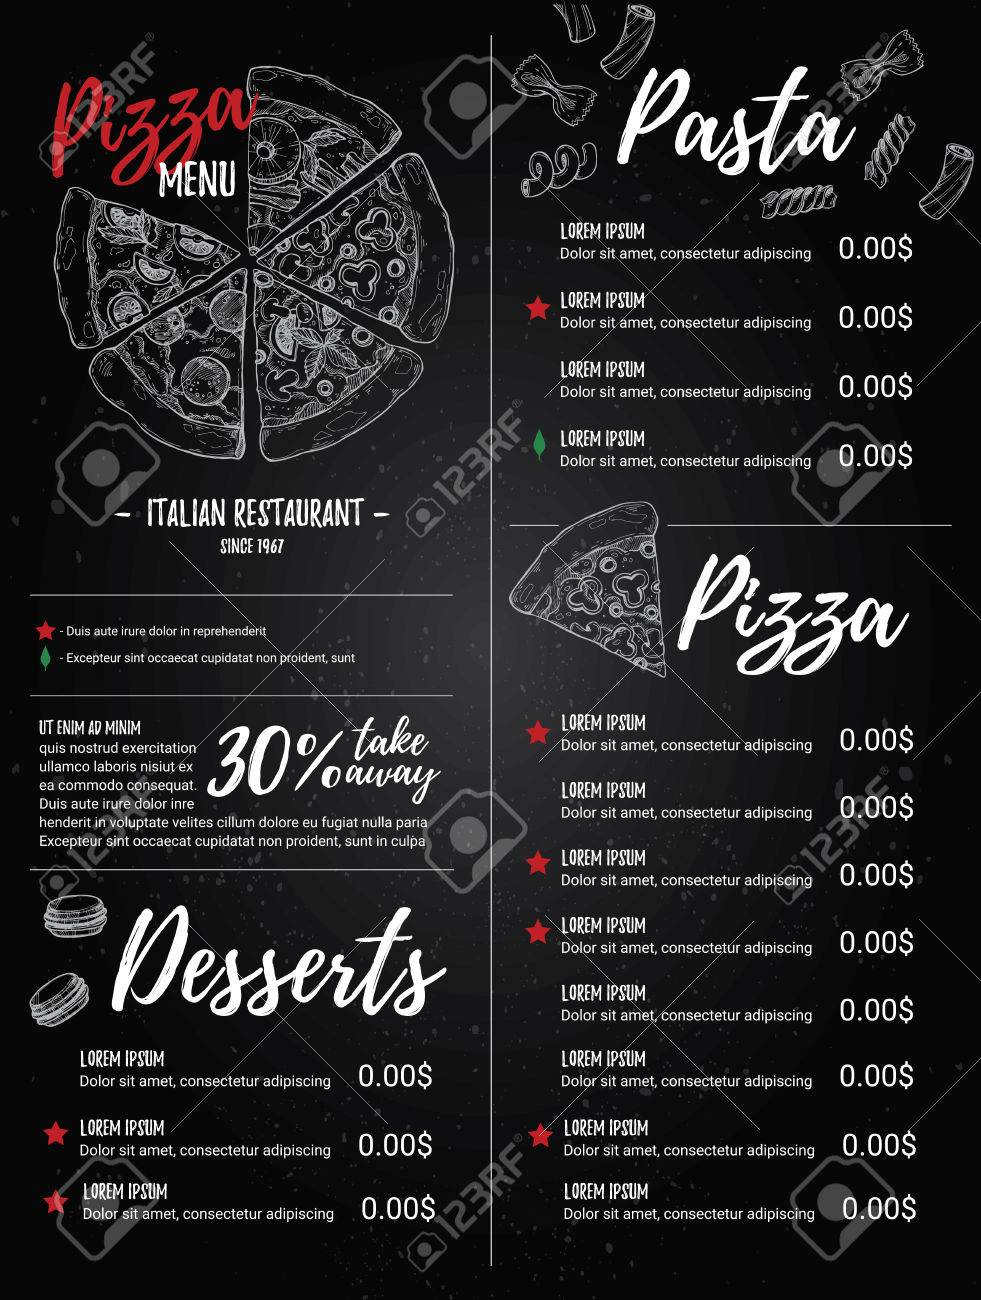 Hand Drawn Illustration Italian Menu Pasta And Pizza Perfect Royalty Free Cliparts Vectors And Stock Illustration Image 72795409